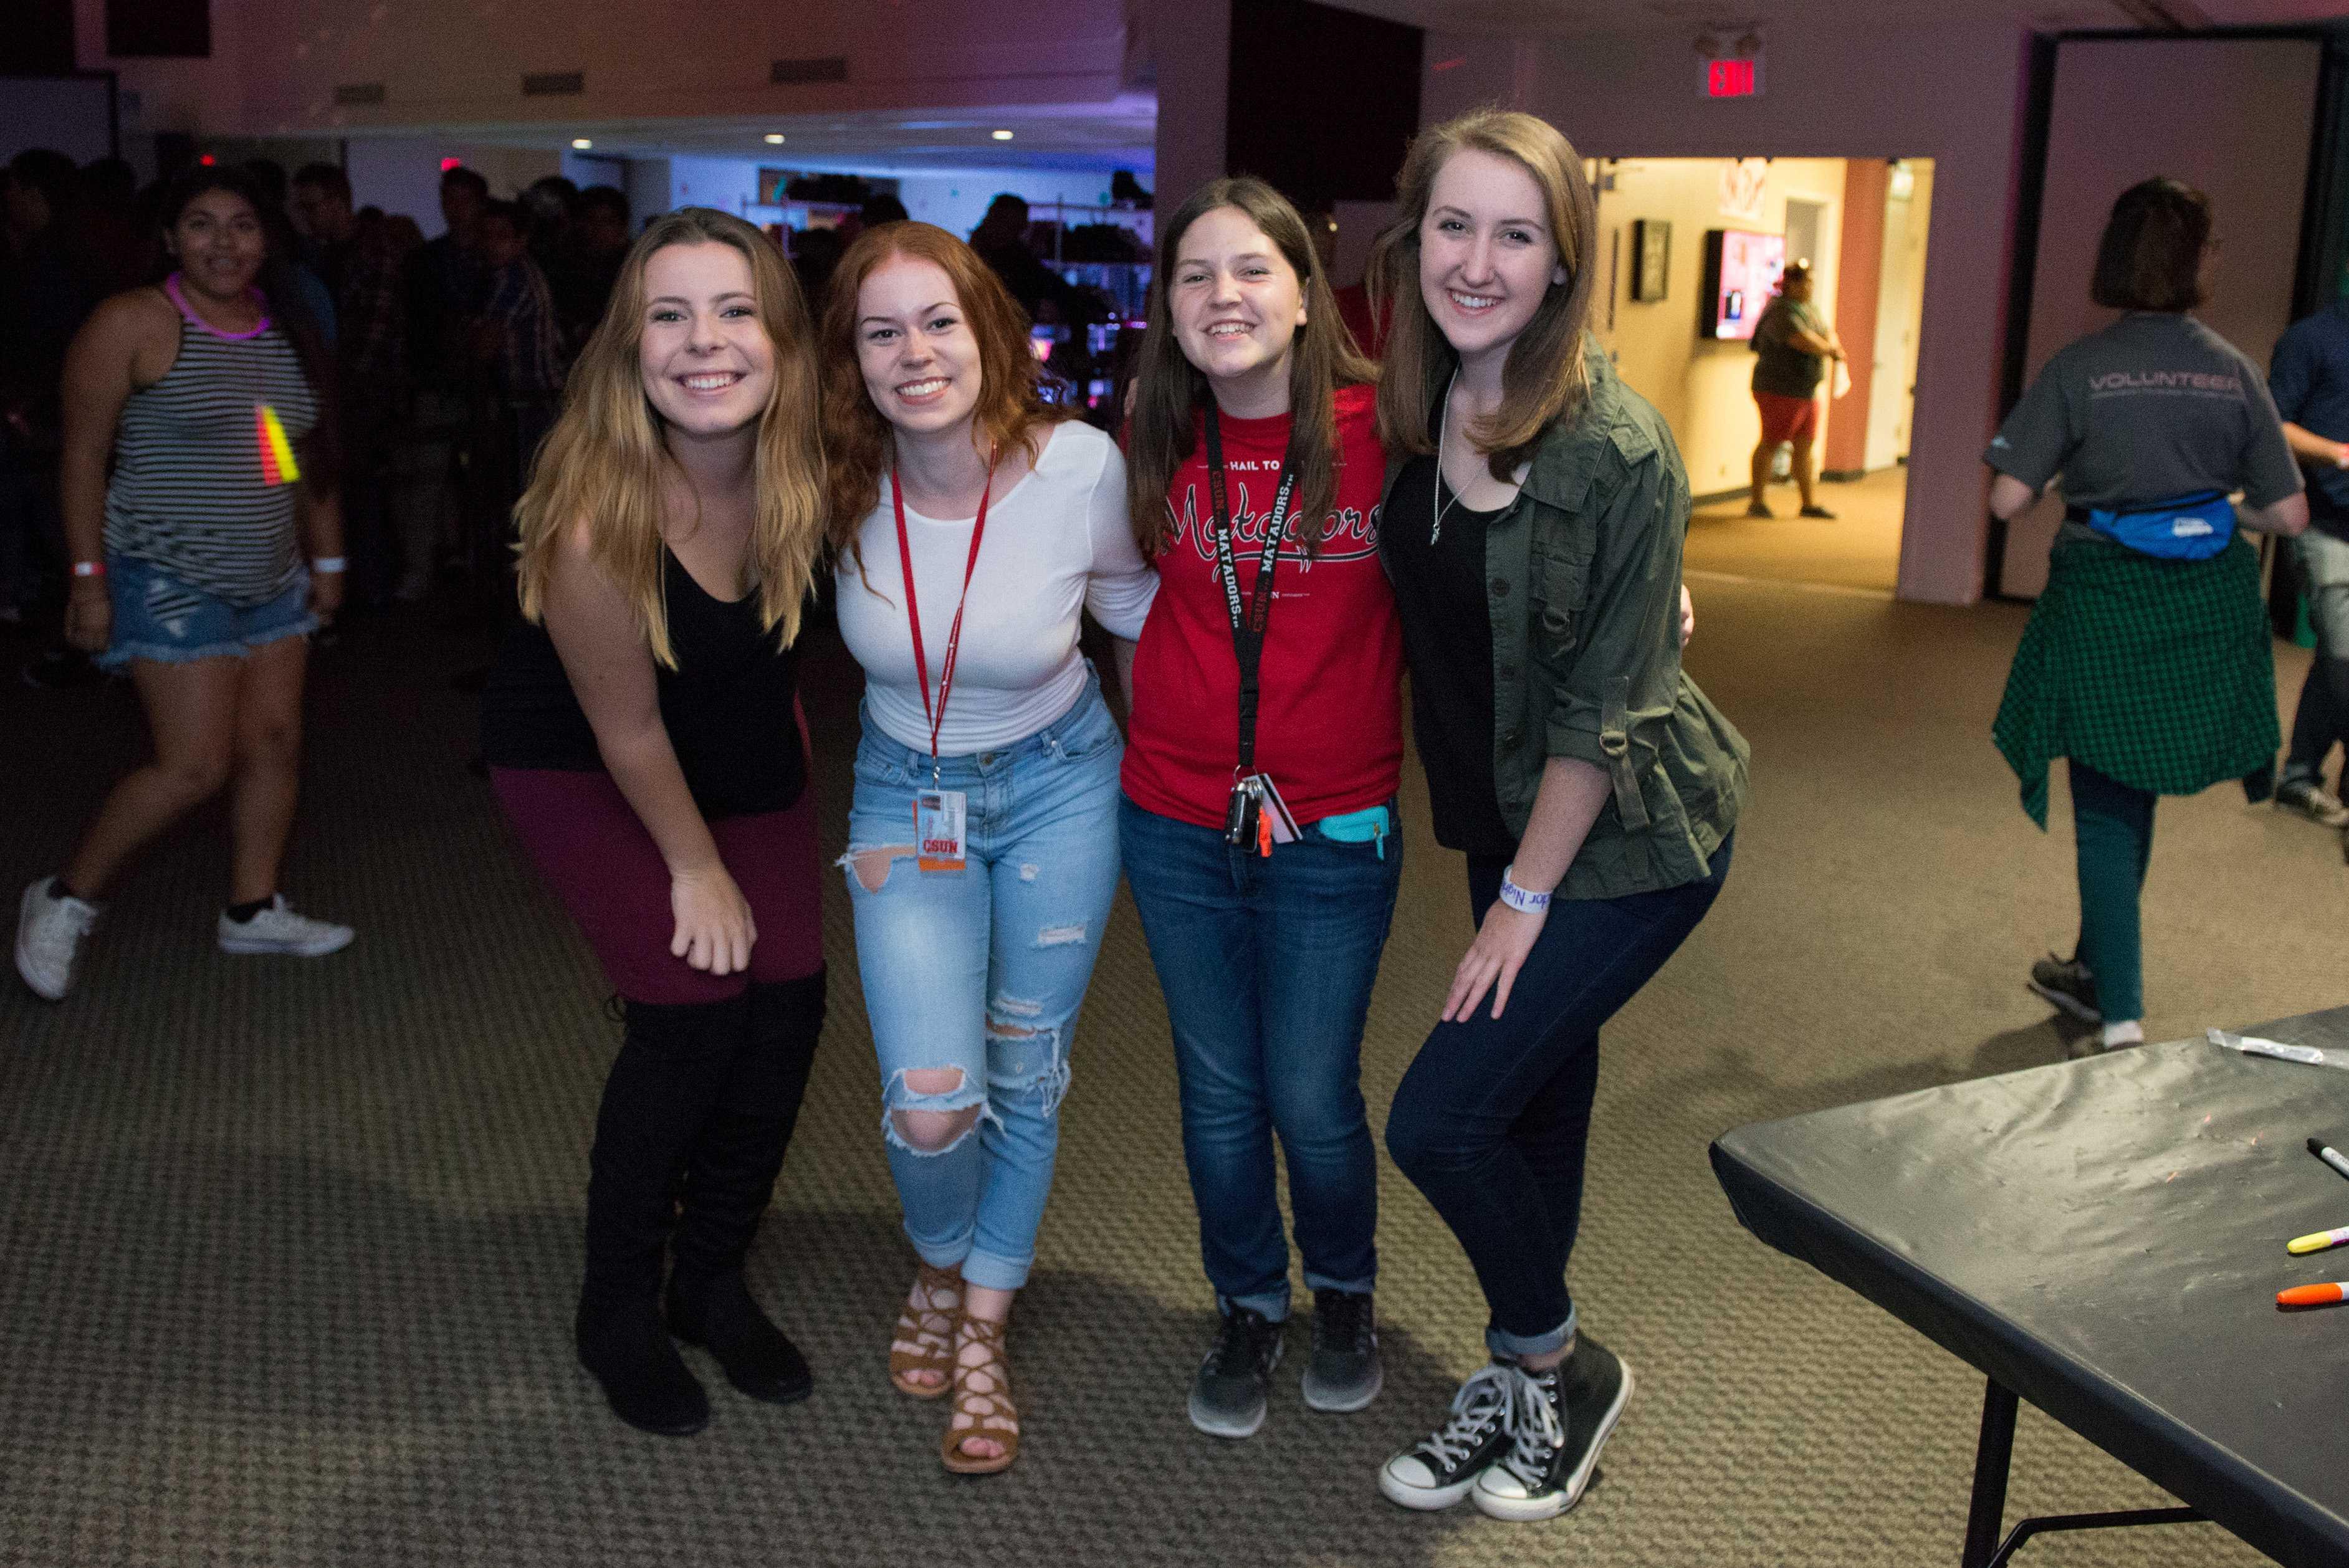 4 freshmen pictured at matador nights